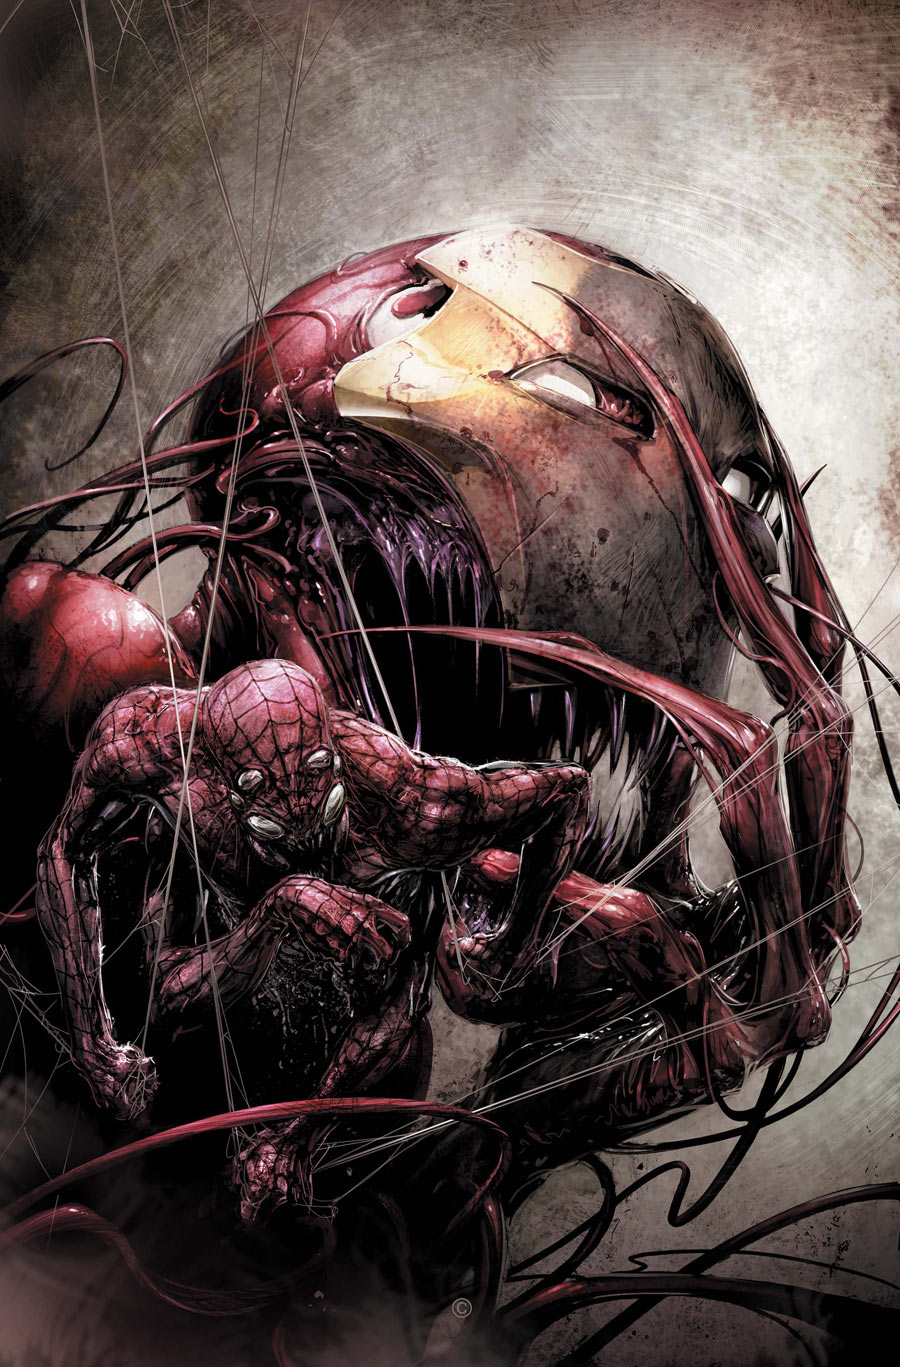 Spiderman vs carnage drawings - photo#20